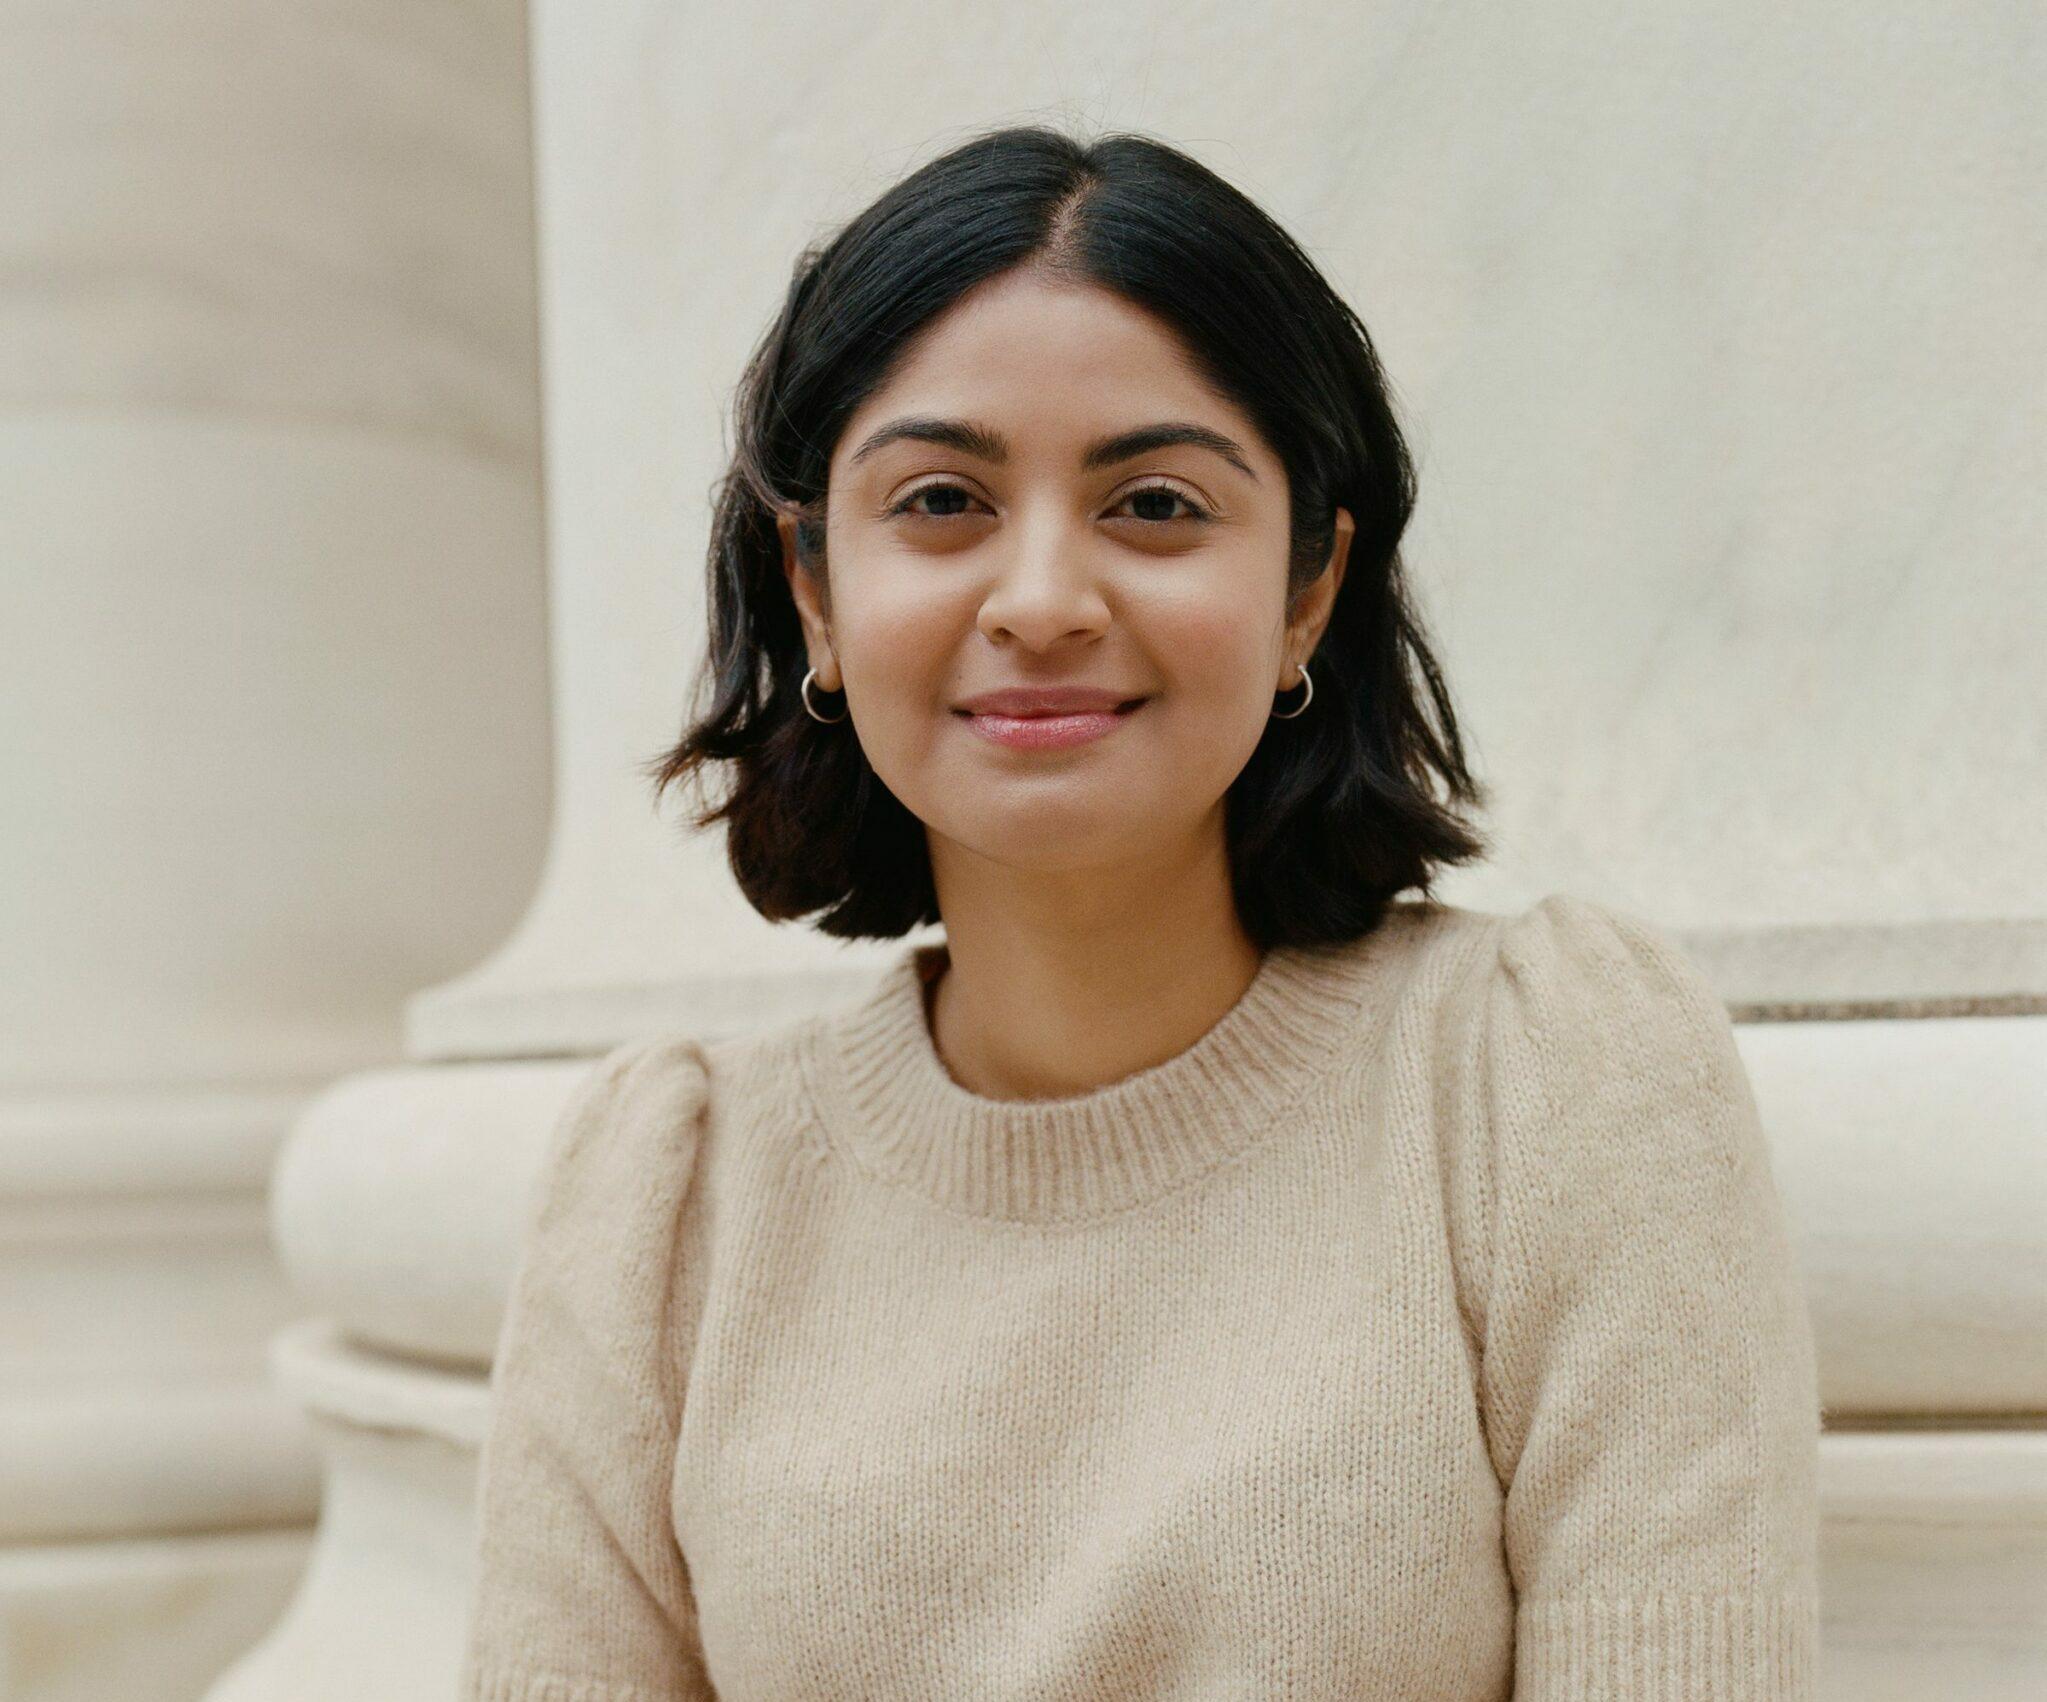 Varuna Srinivasan, MBBS, MPH